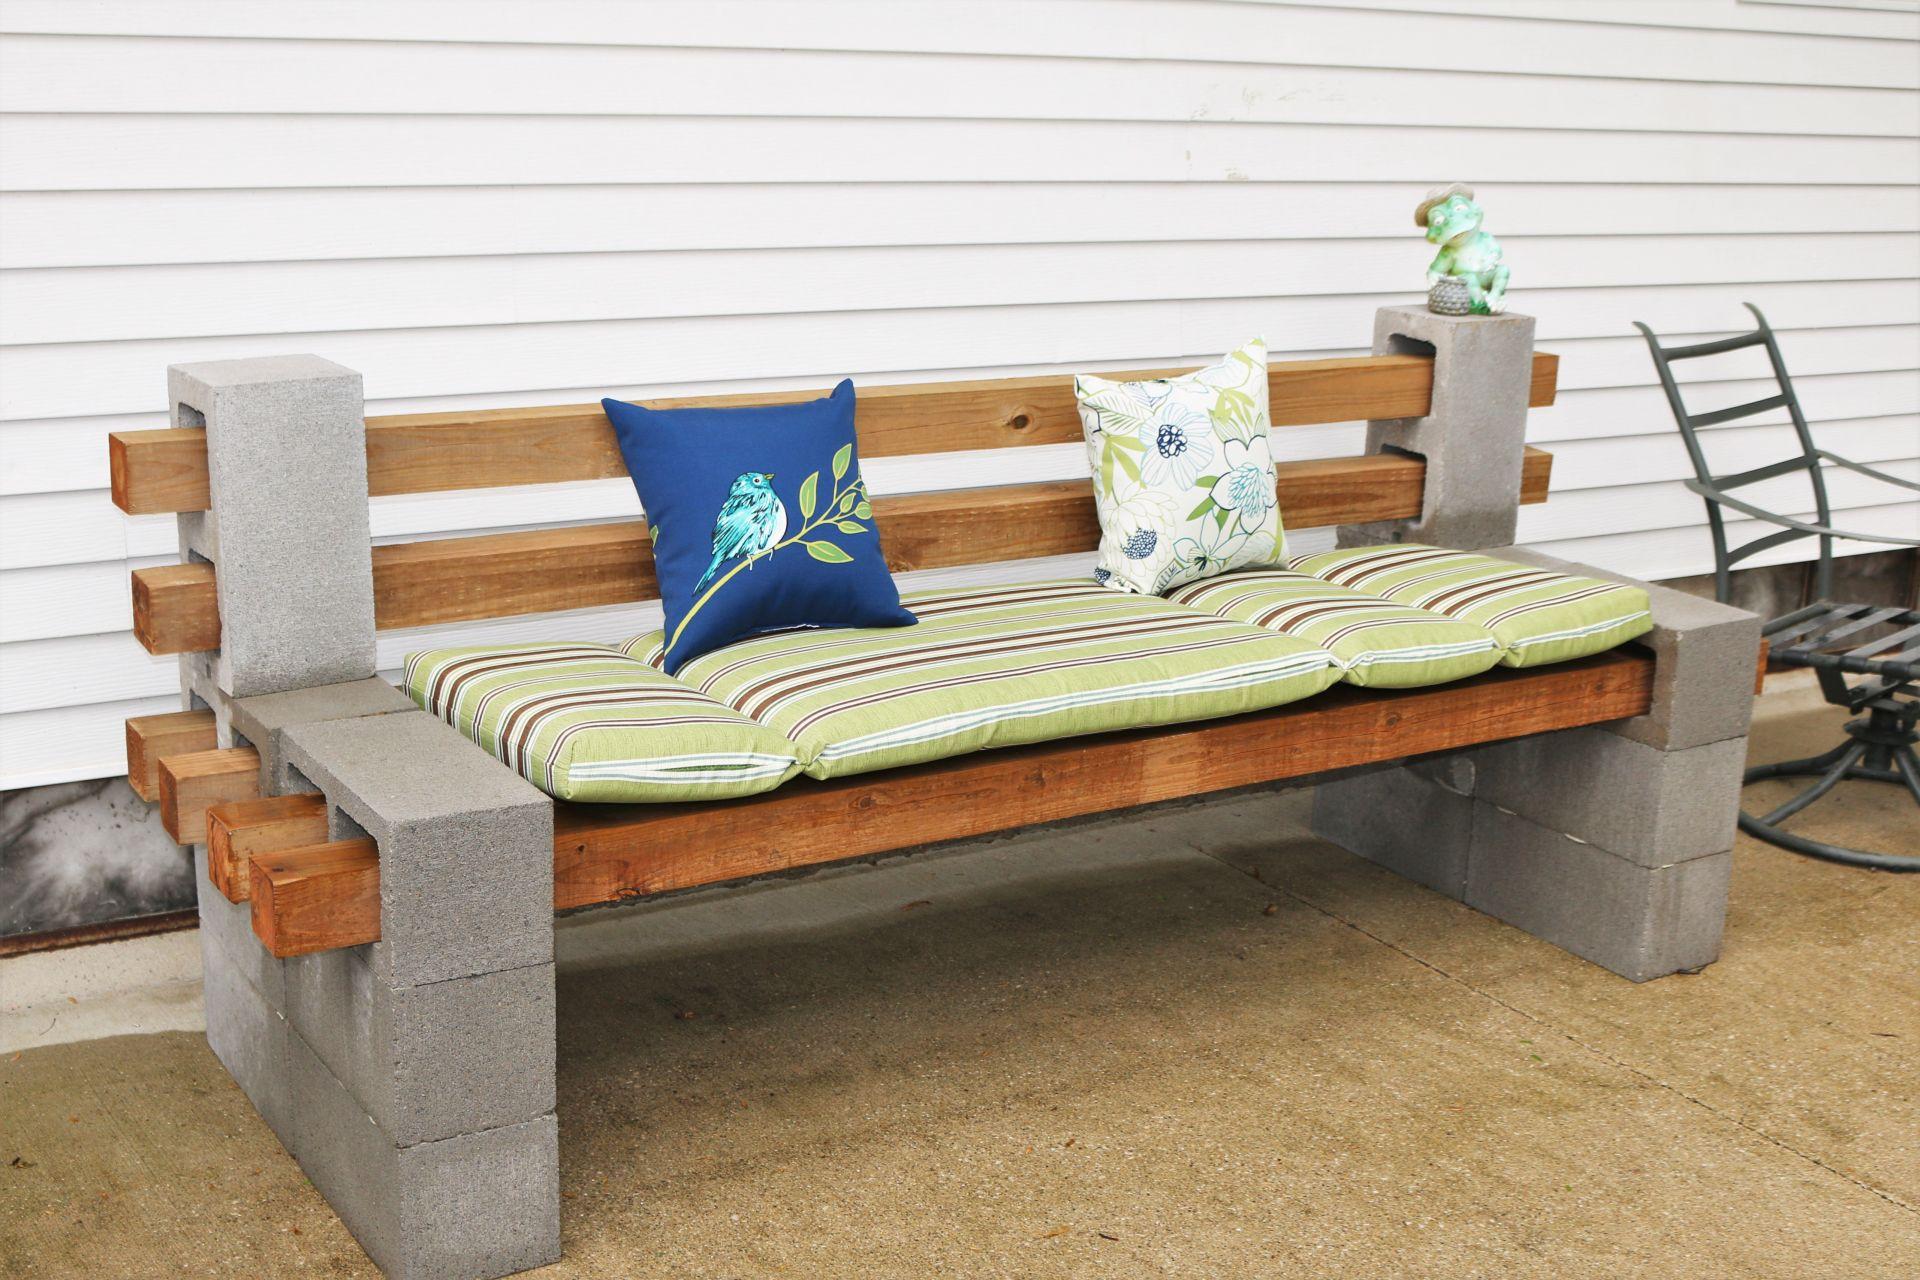 DIY CINDER BLOCK BENCH IS YOUR NEXT WEEKEND PROJECT